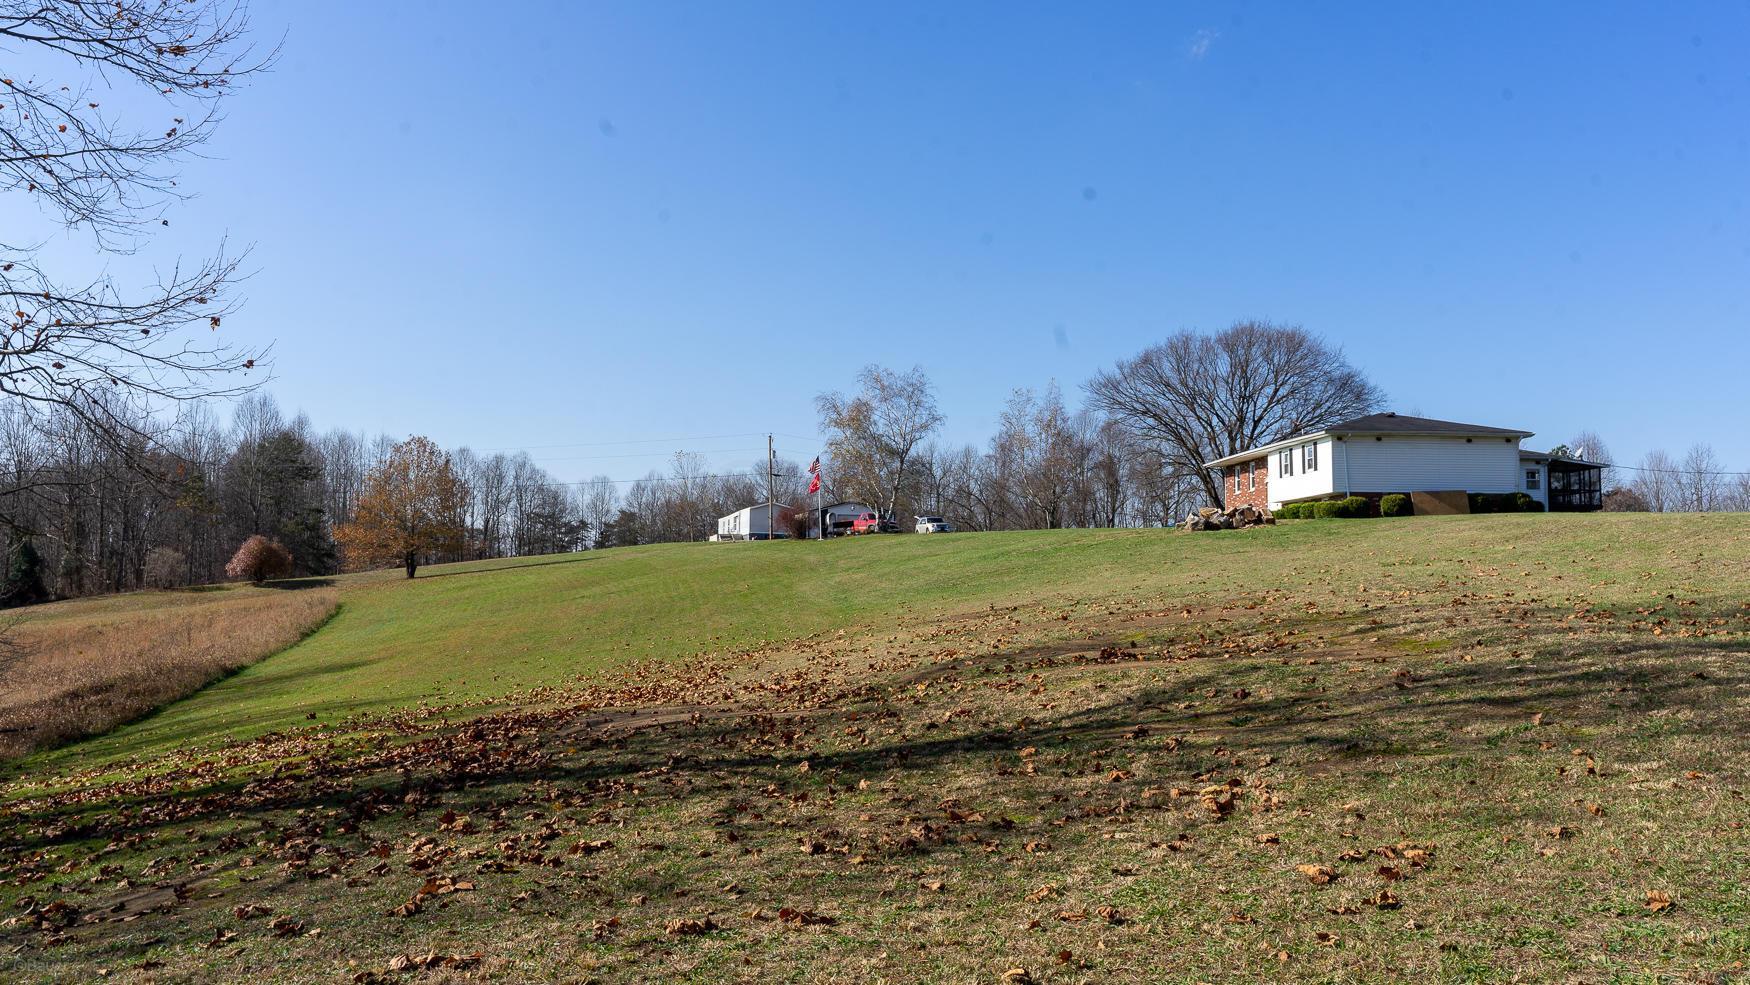 Smith Rd - Sciot County-47